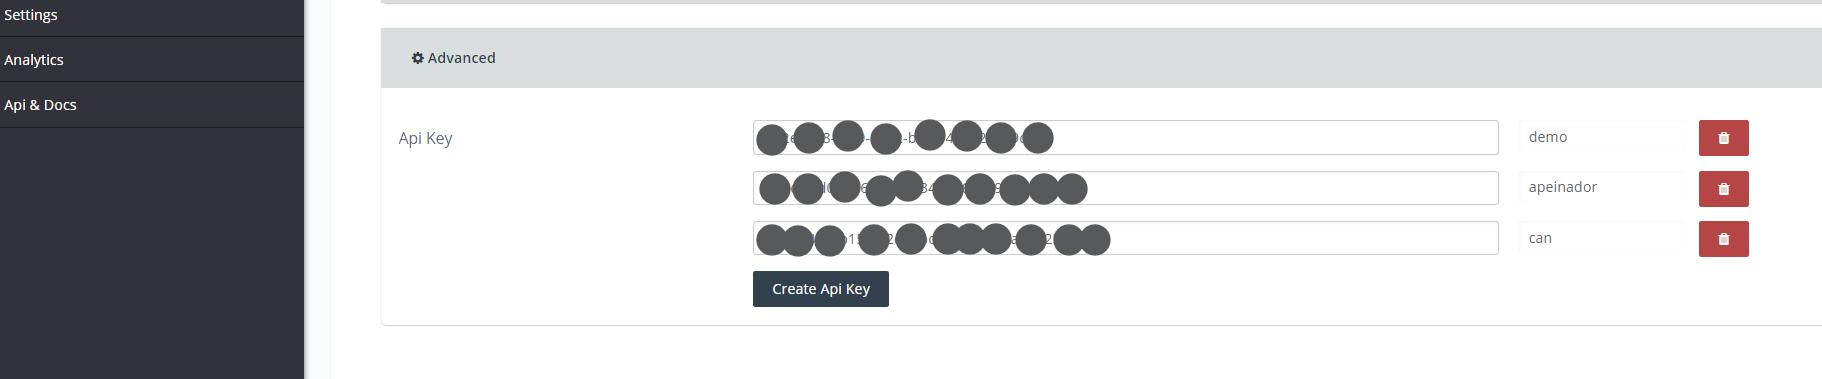 Cinema8 Interactive Video Articles - How To Create API Key For Development Purposes